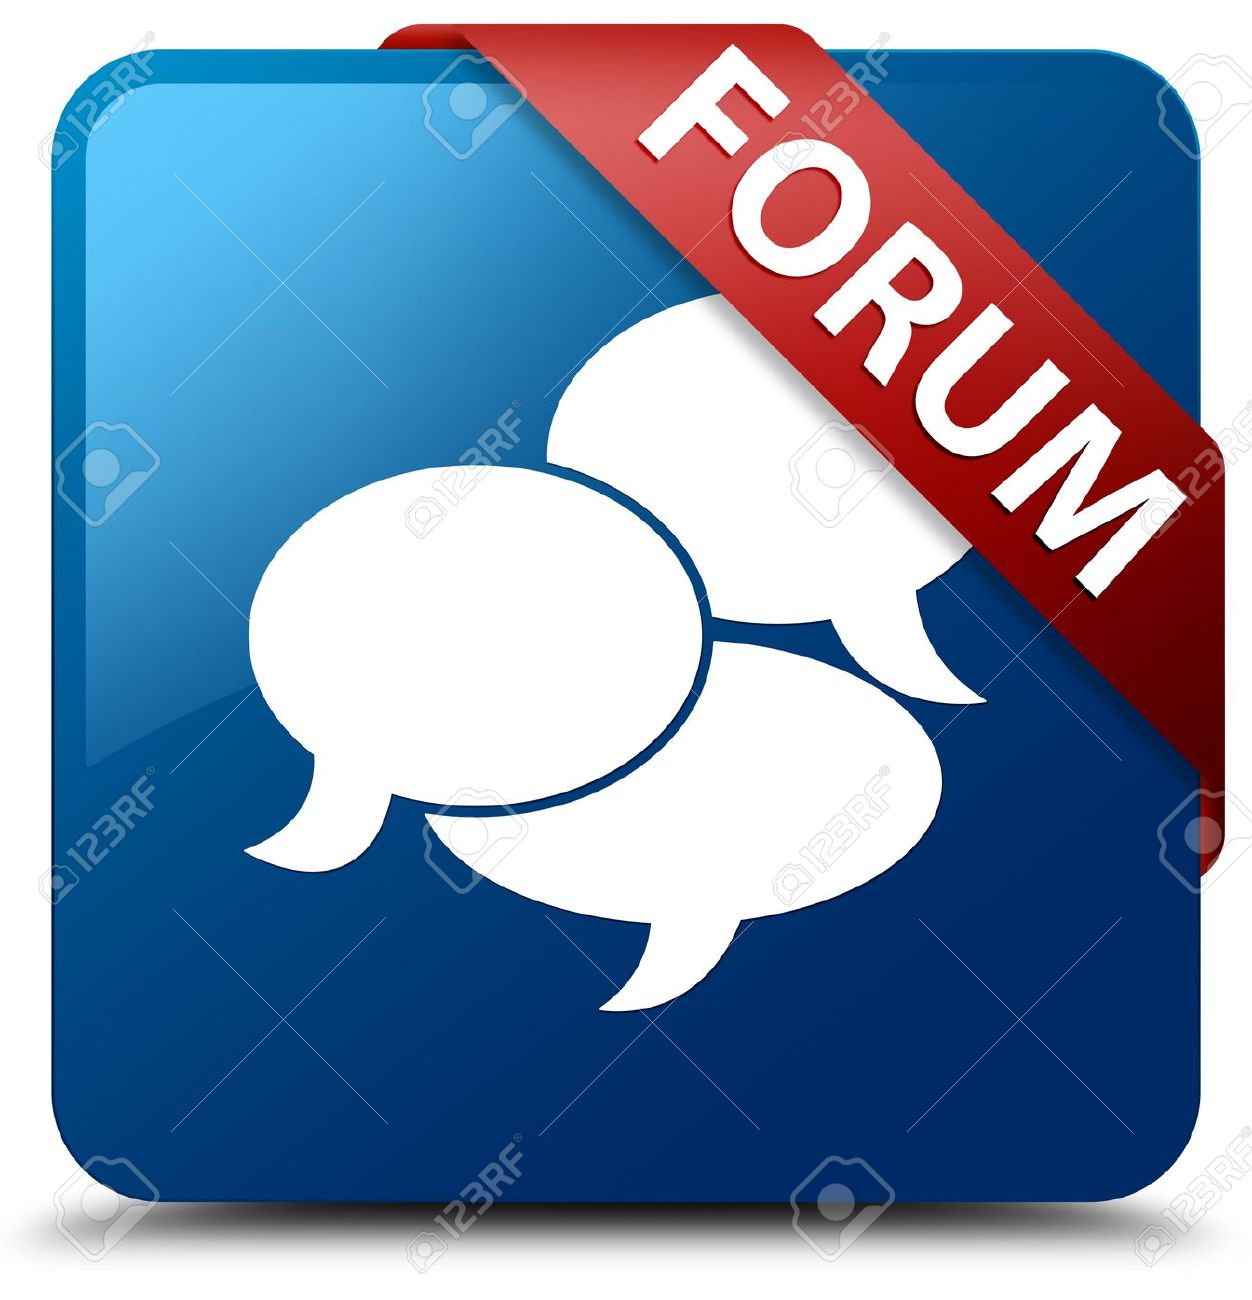 Free forum clipart.